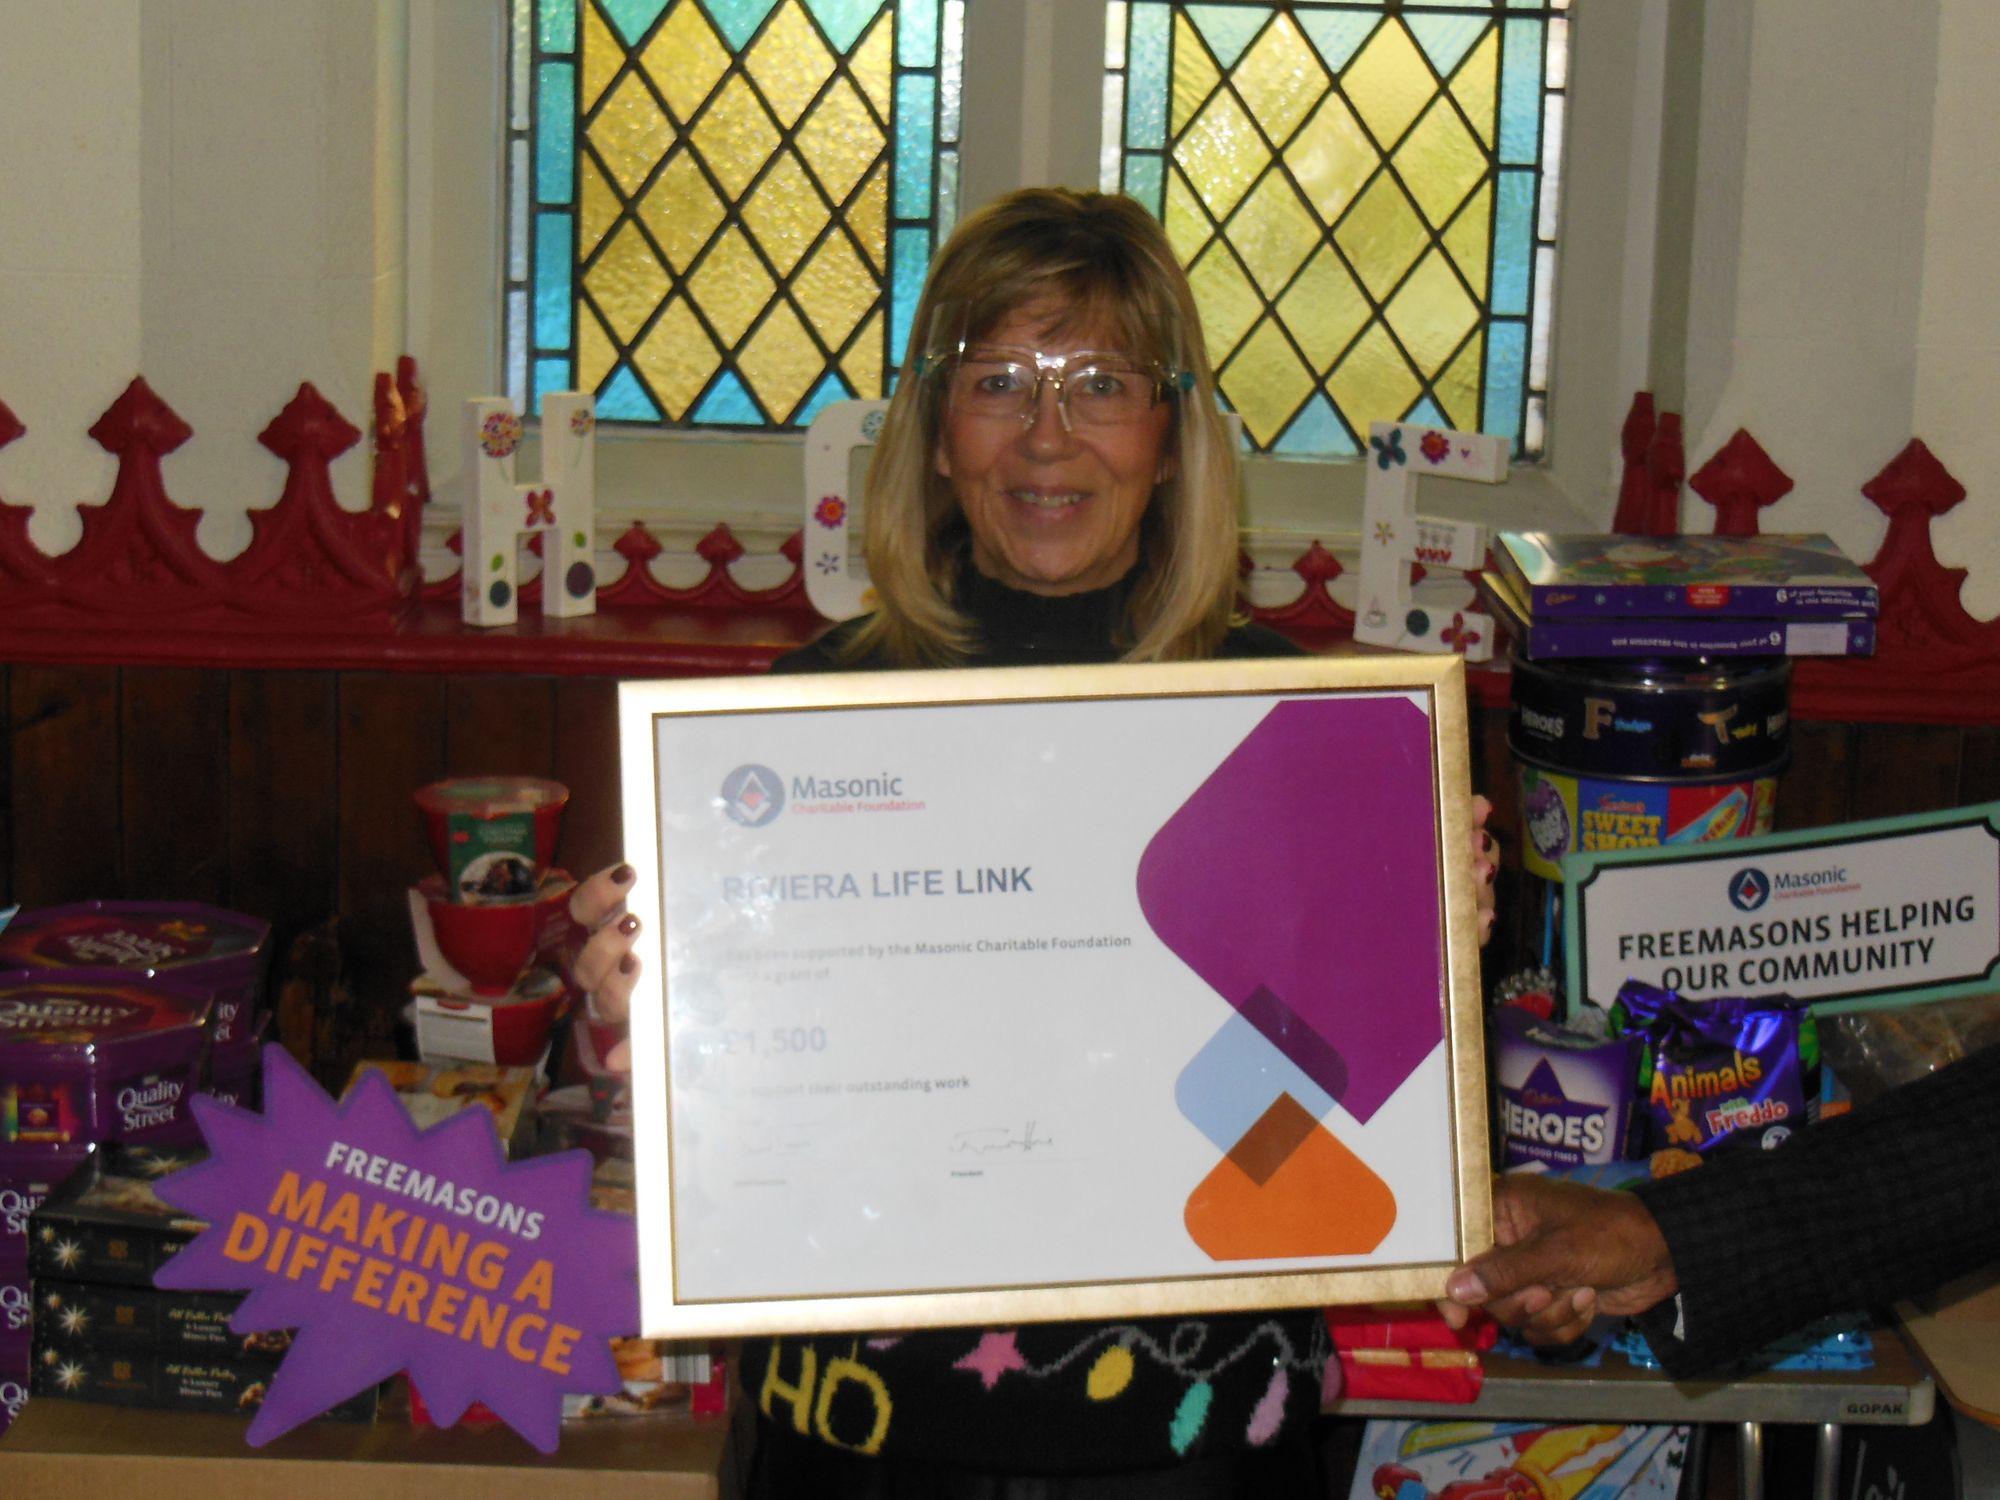 England - Lifeline for Torquay foodbank as Freemasons step in with donation